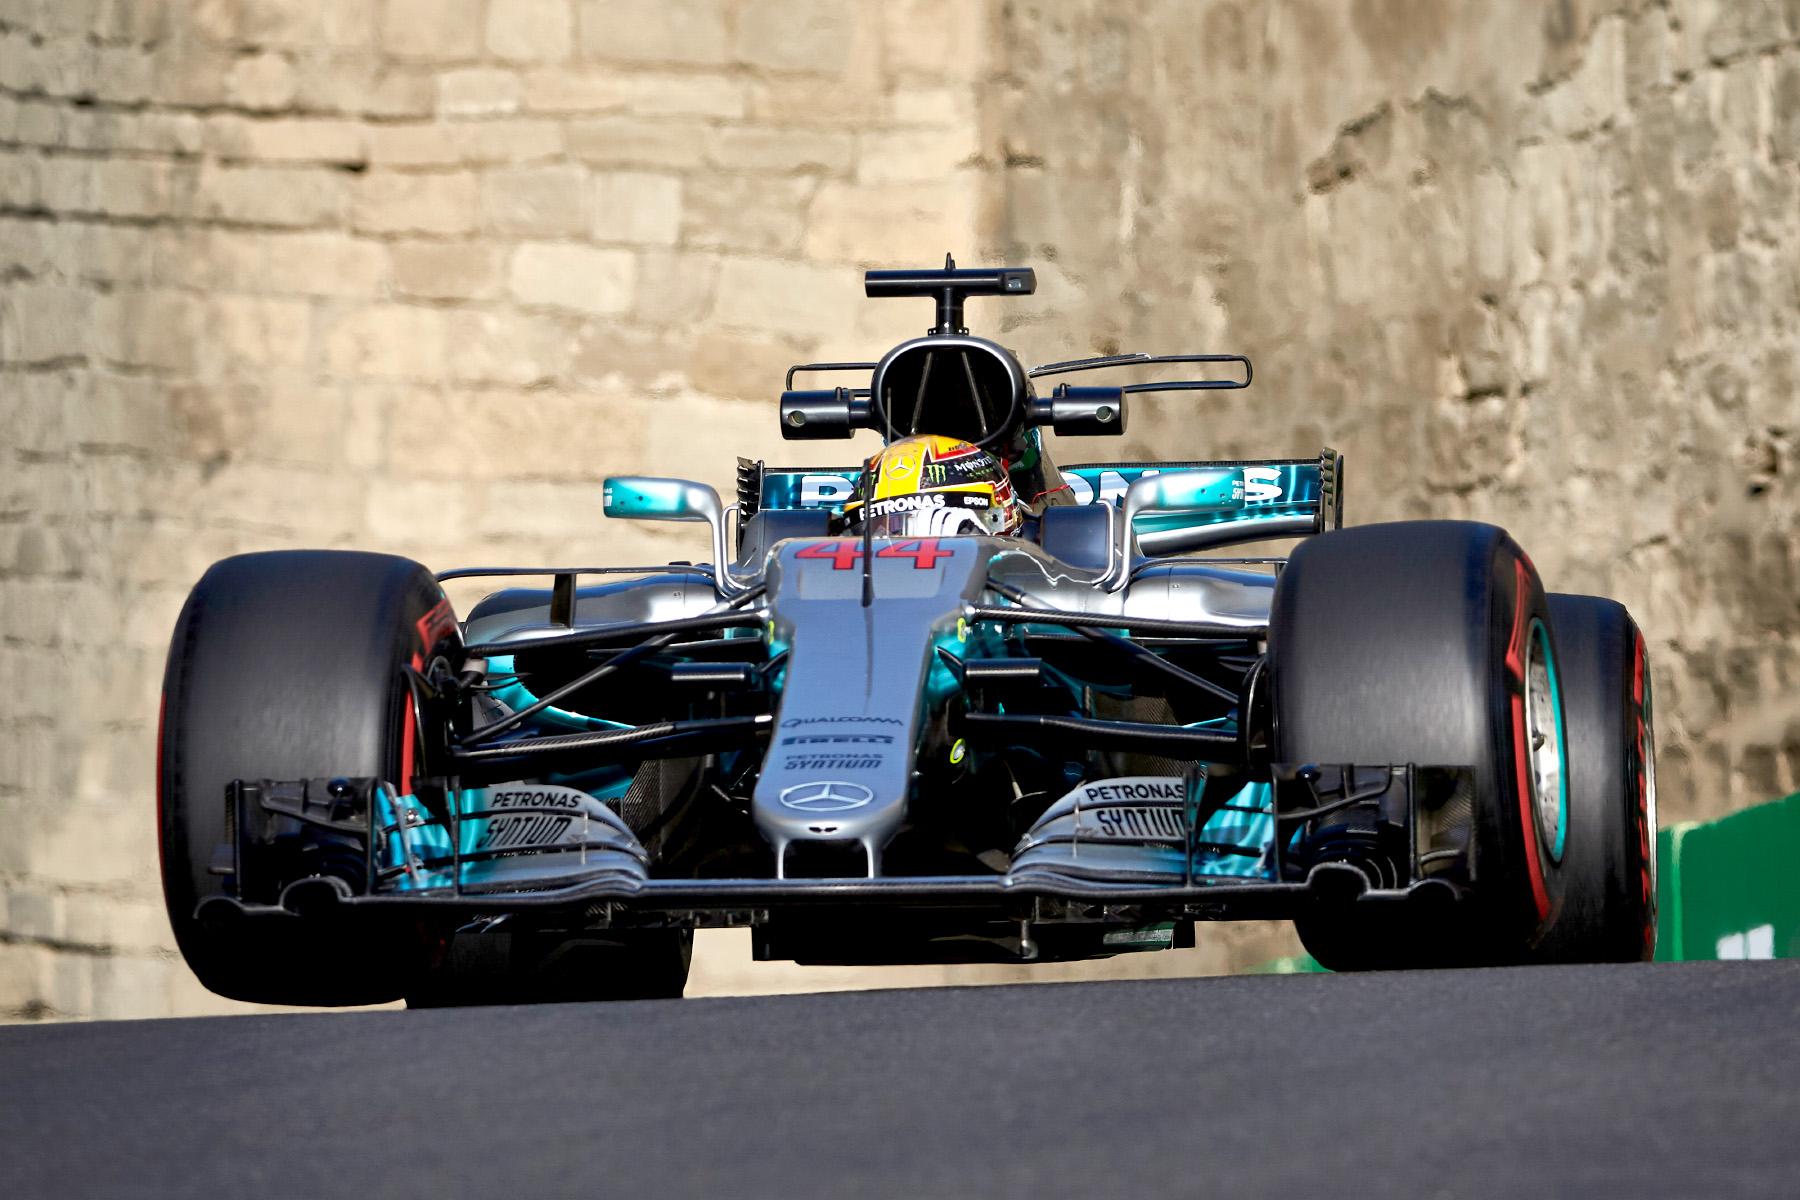 Lewis Hamilton in his Mercedes in Baku.